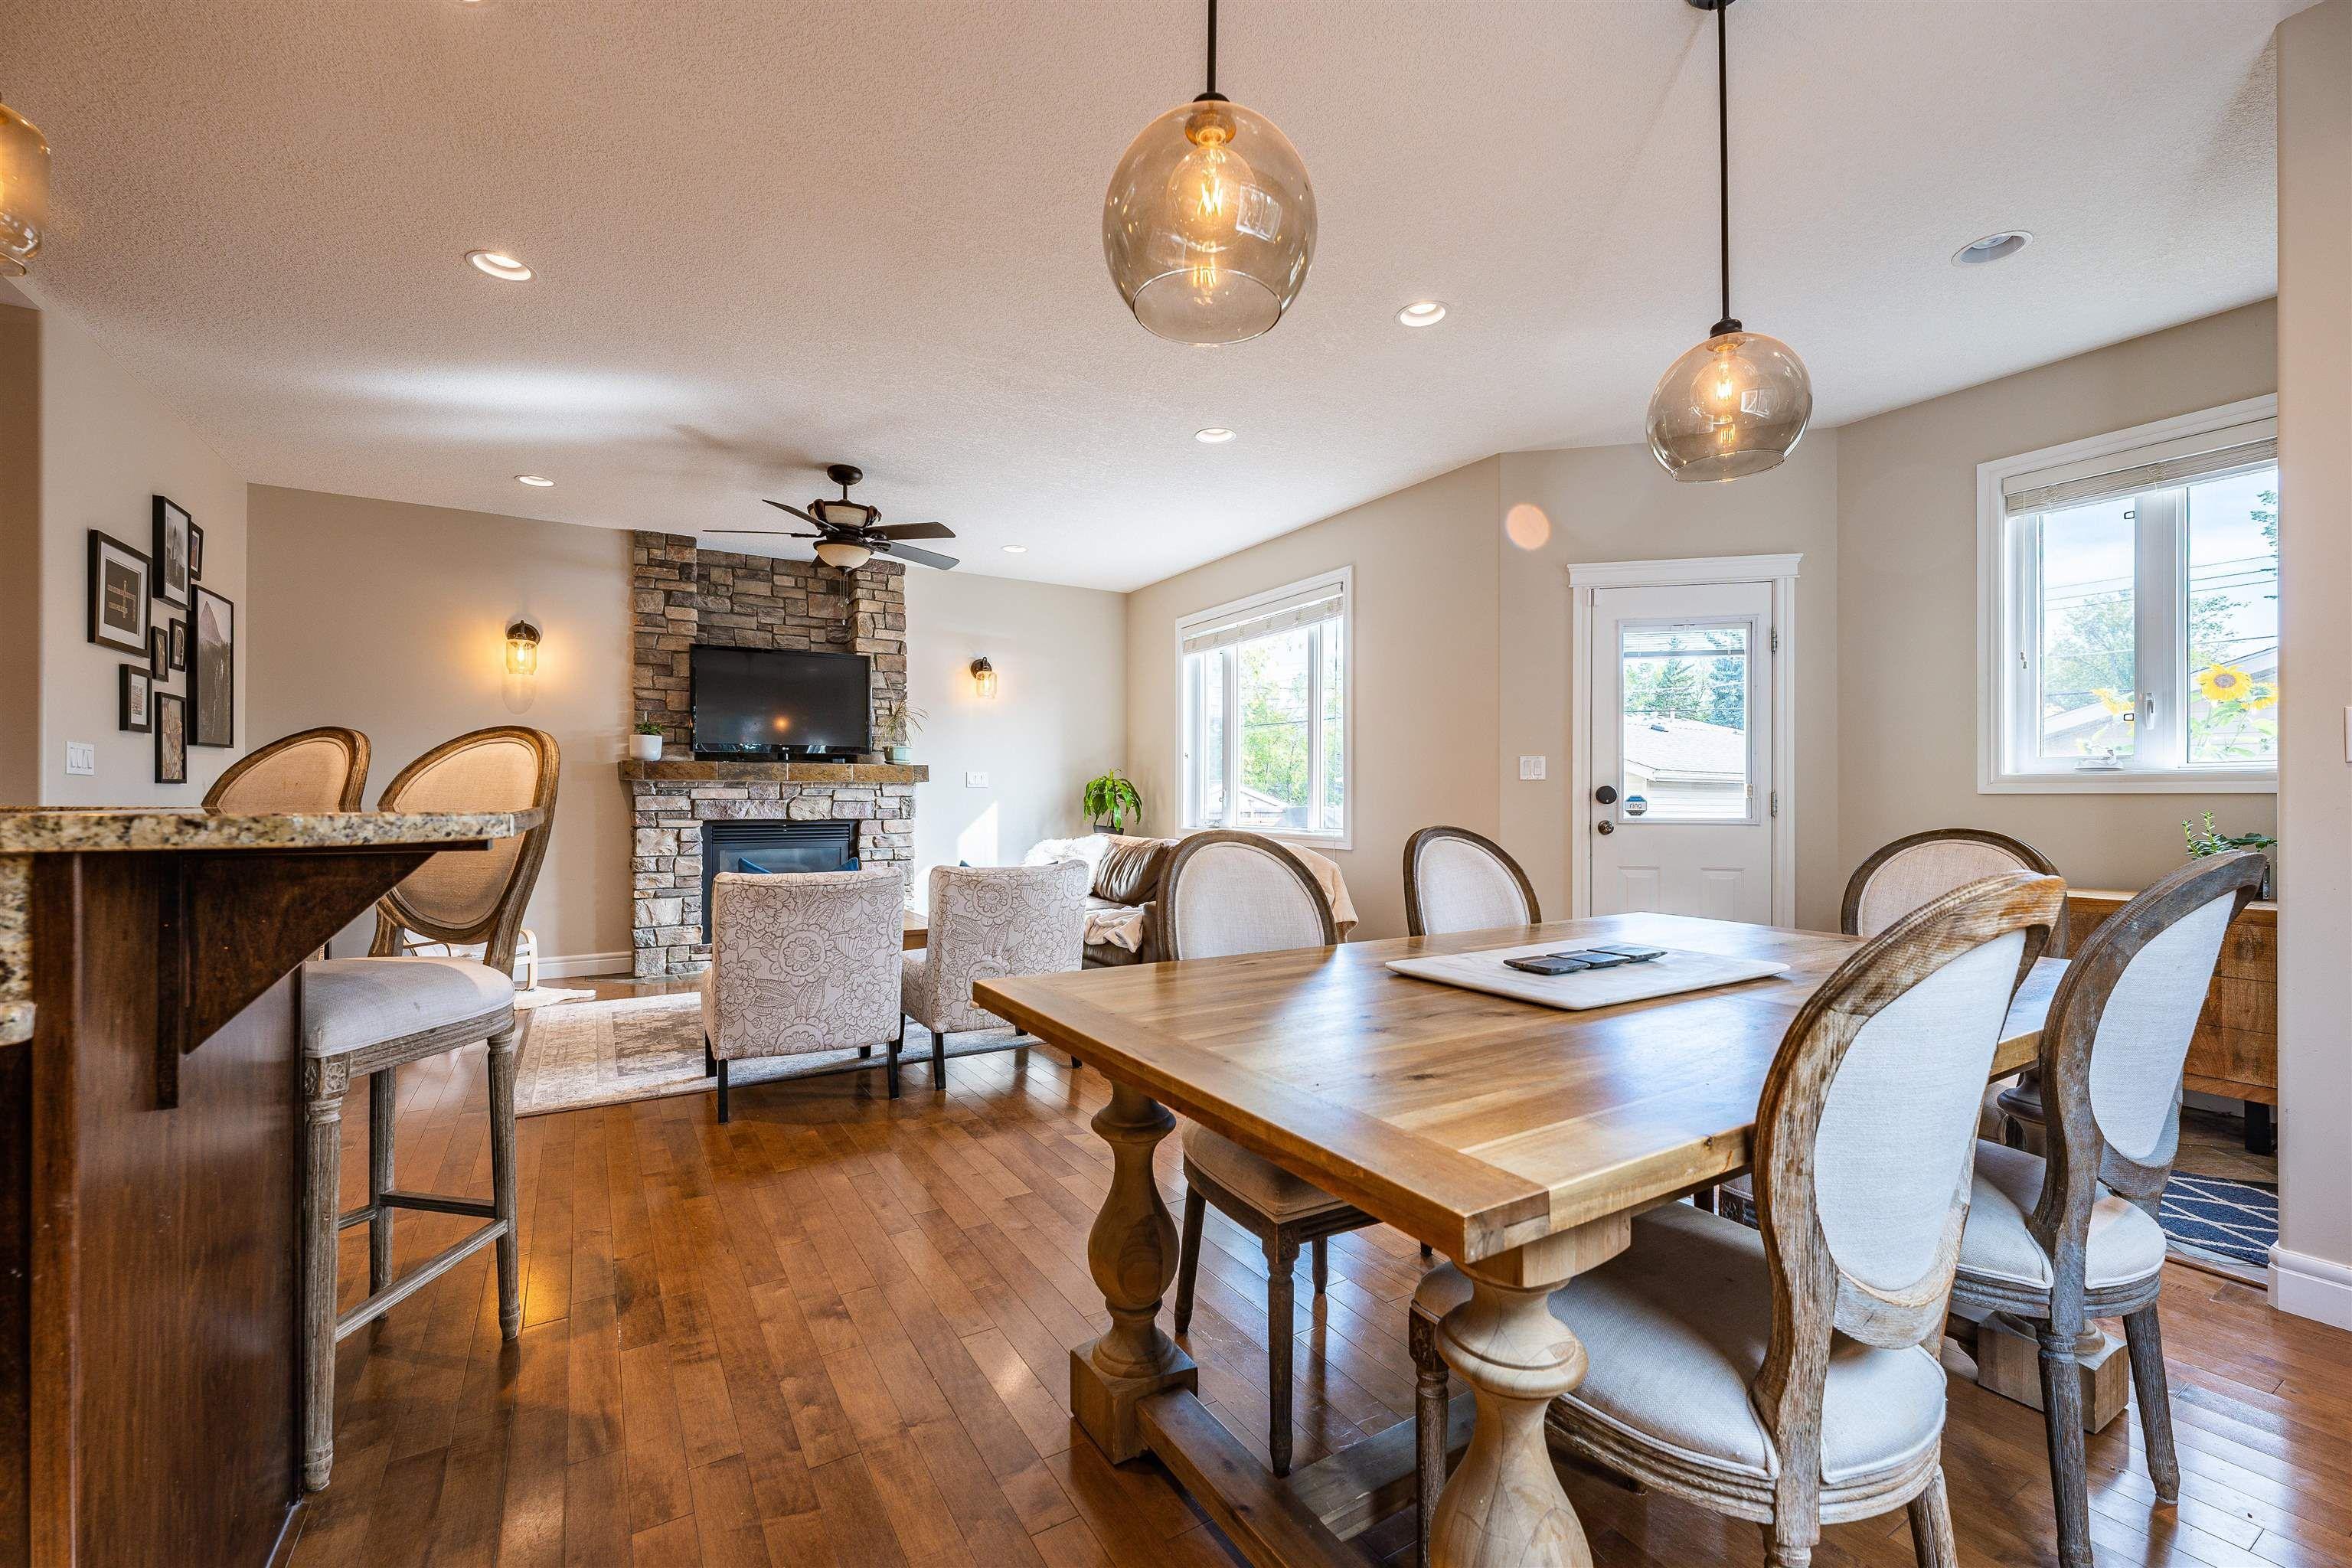 Main Photo: 10935 72 Avenue in Edmonton: Zone 15 House for sale : MLS®# E4262498